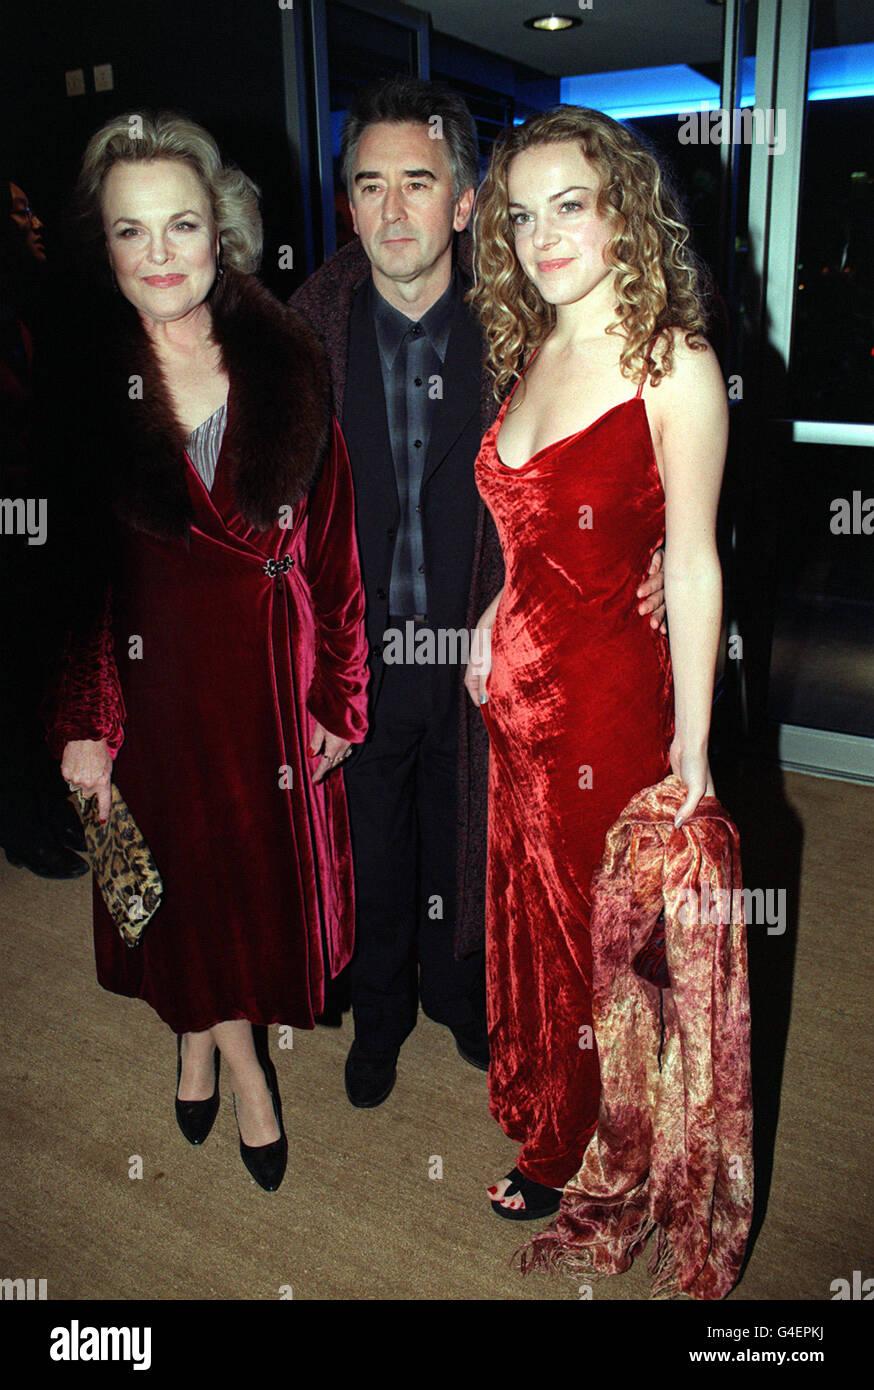 Imelda Staunton (born 1956),Jane Horrocks Erotic video Peter Cook (1937?995),Sofia Vassilieva born October 22, 1992 (age 26)